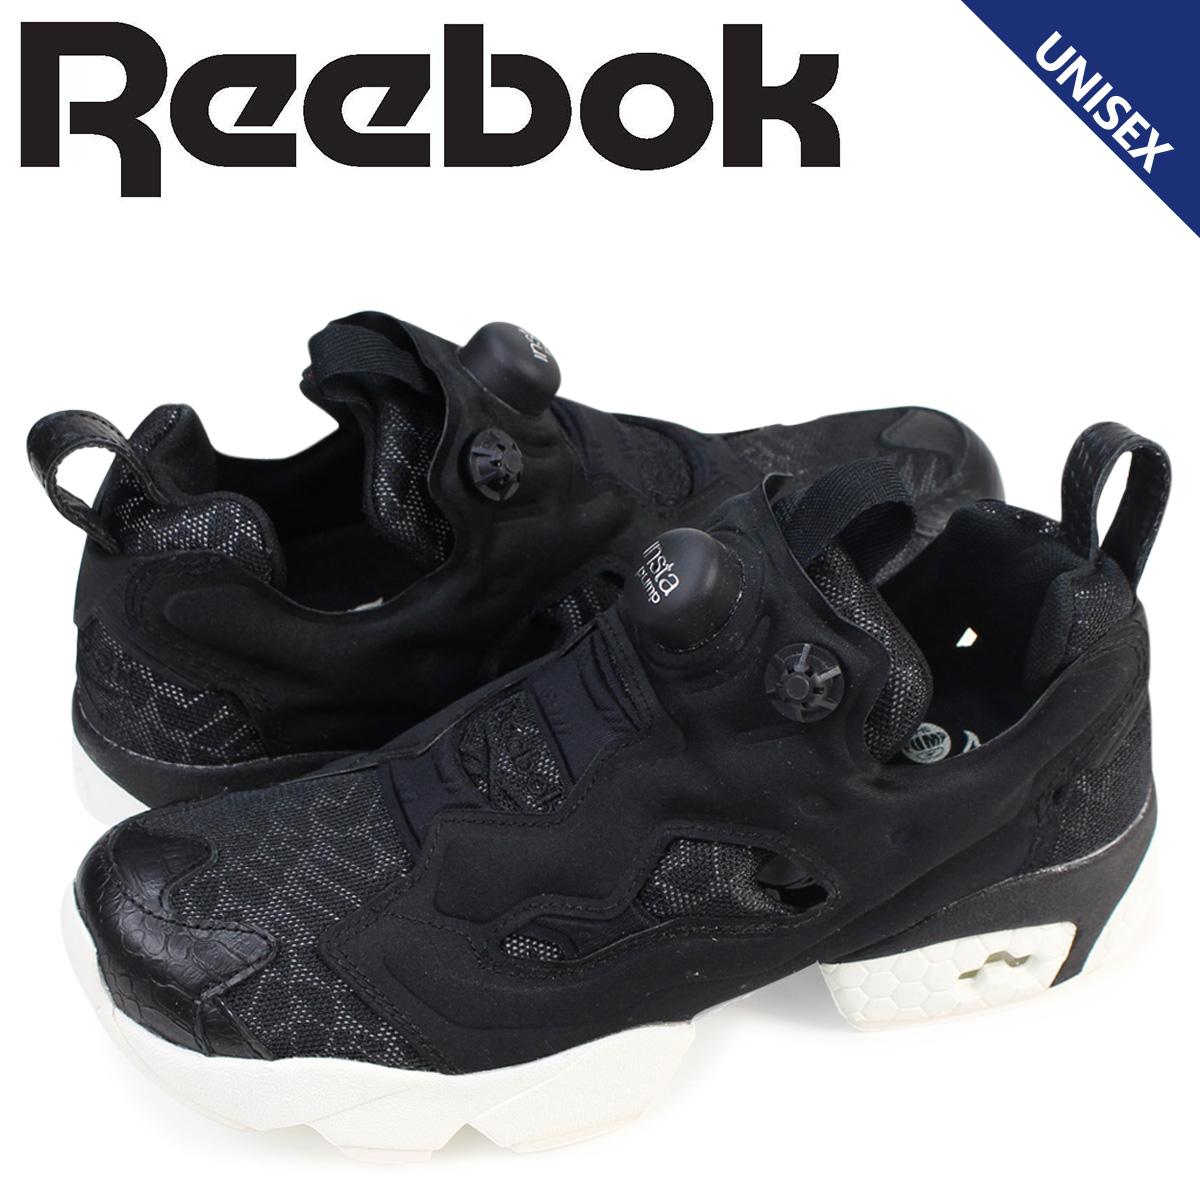 Reebok ポンプフューリー スニーカー リーボック INSTAPUMP FURY OG メンズ レディース AQ9079 靴 ブラック 【決算セール 返品不可】